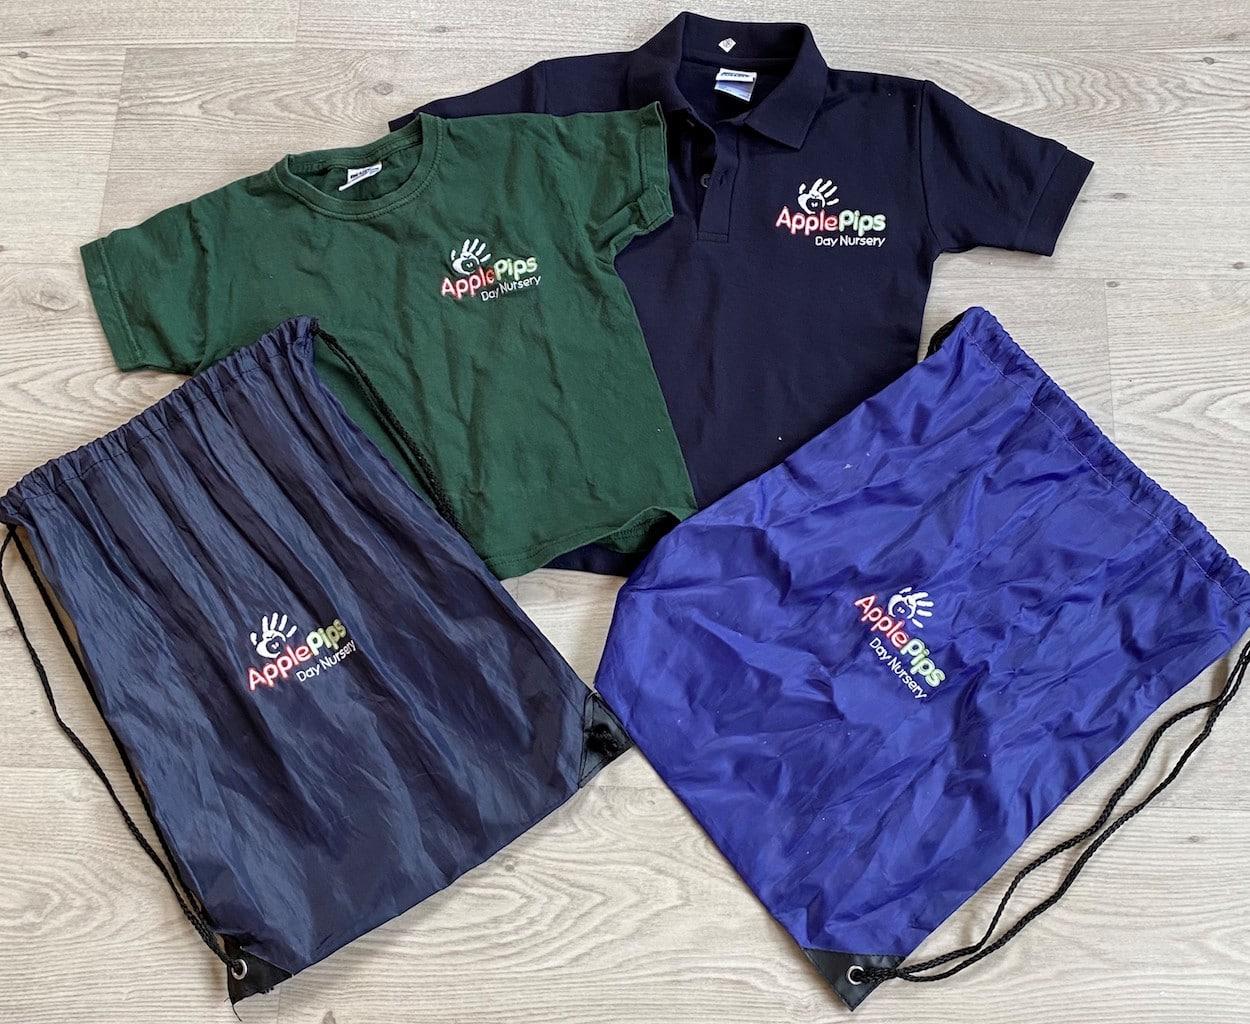 Applepips Uniform and kit bag